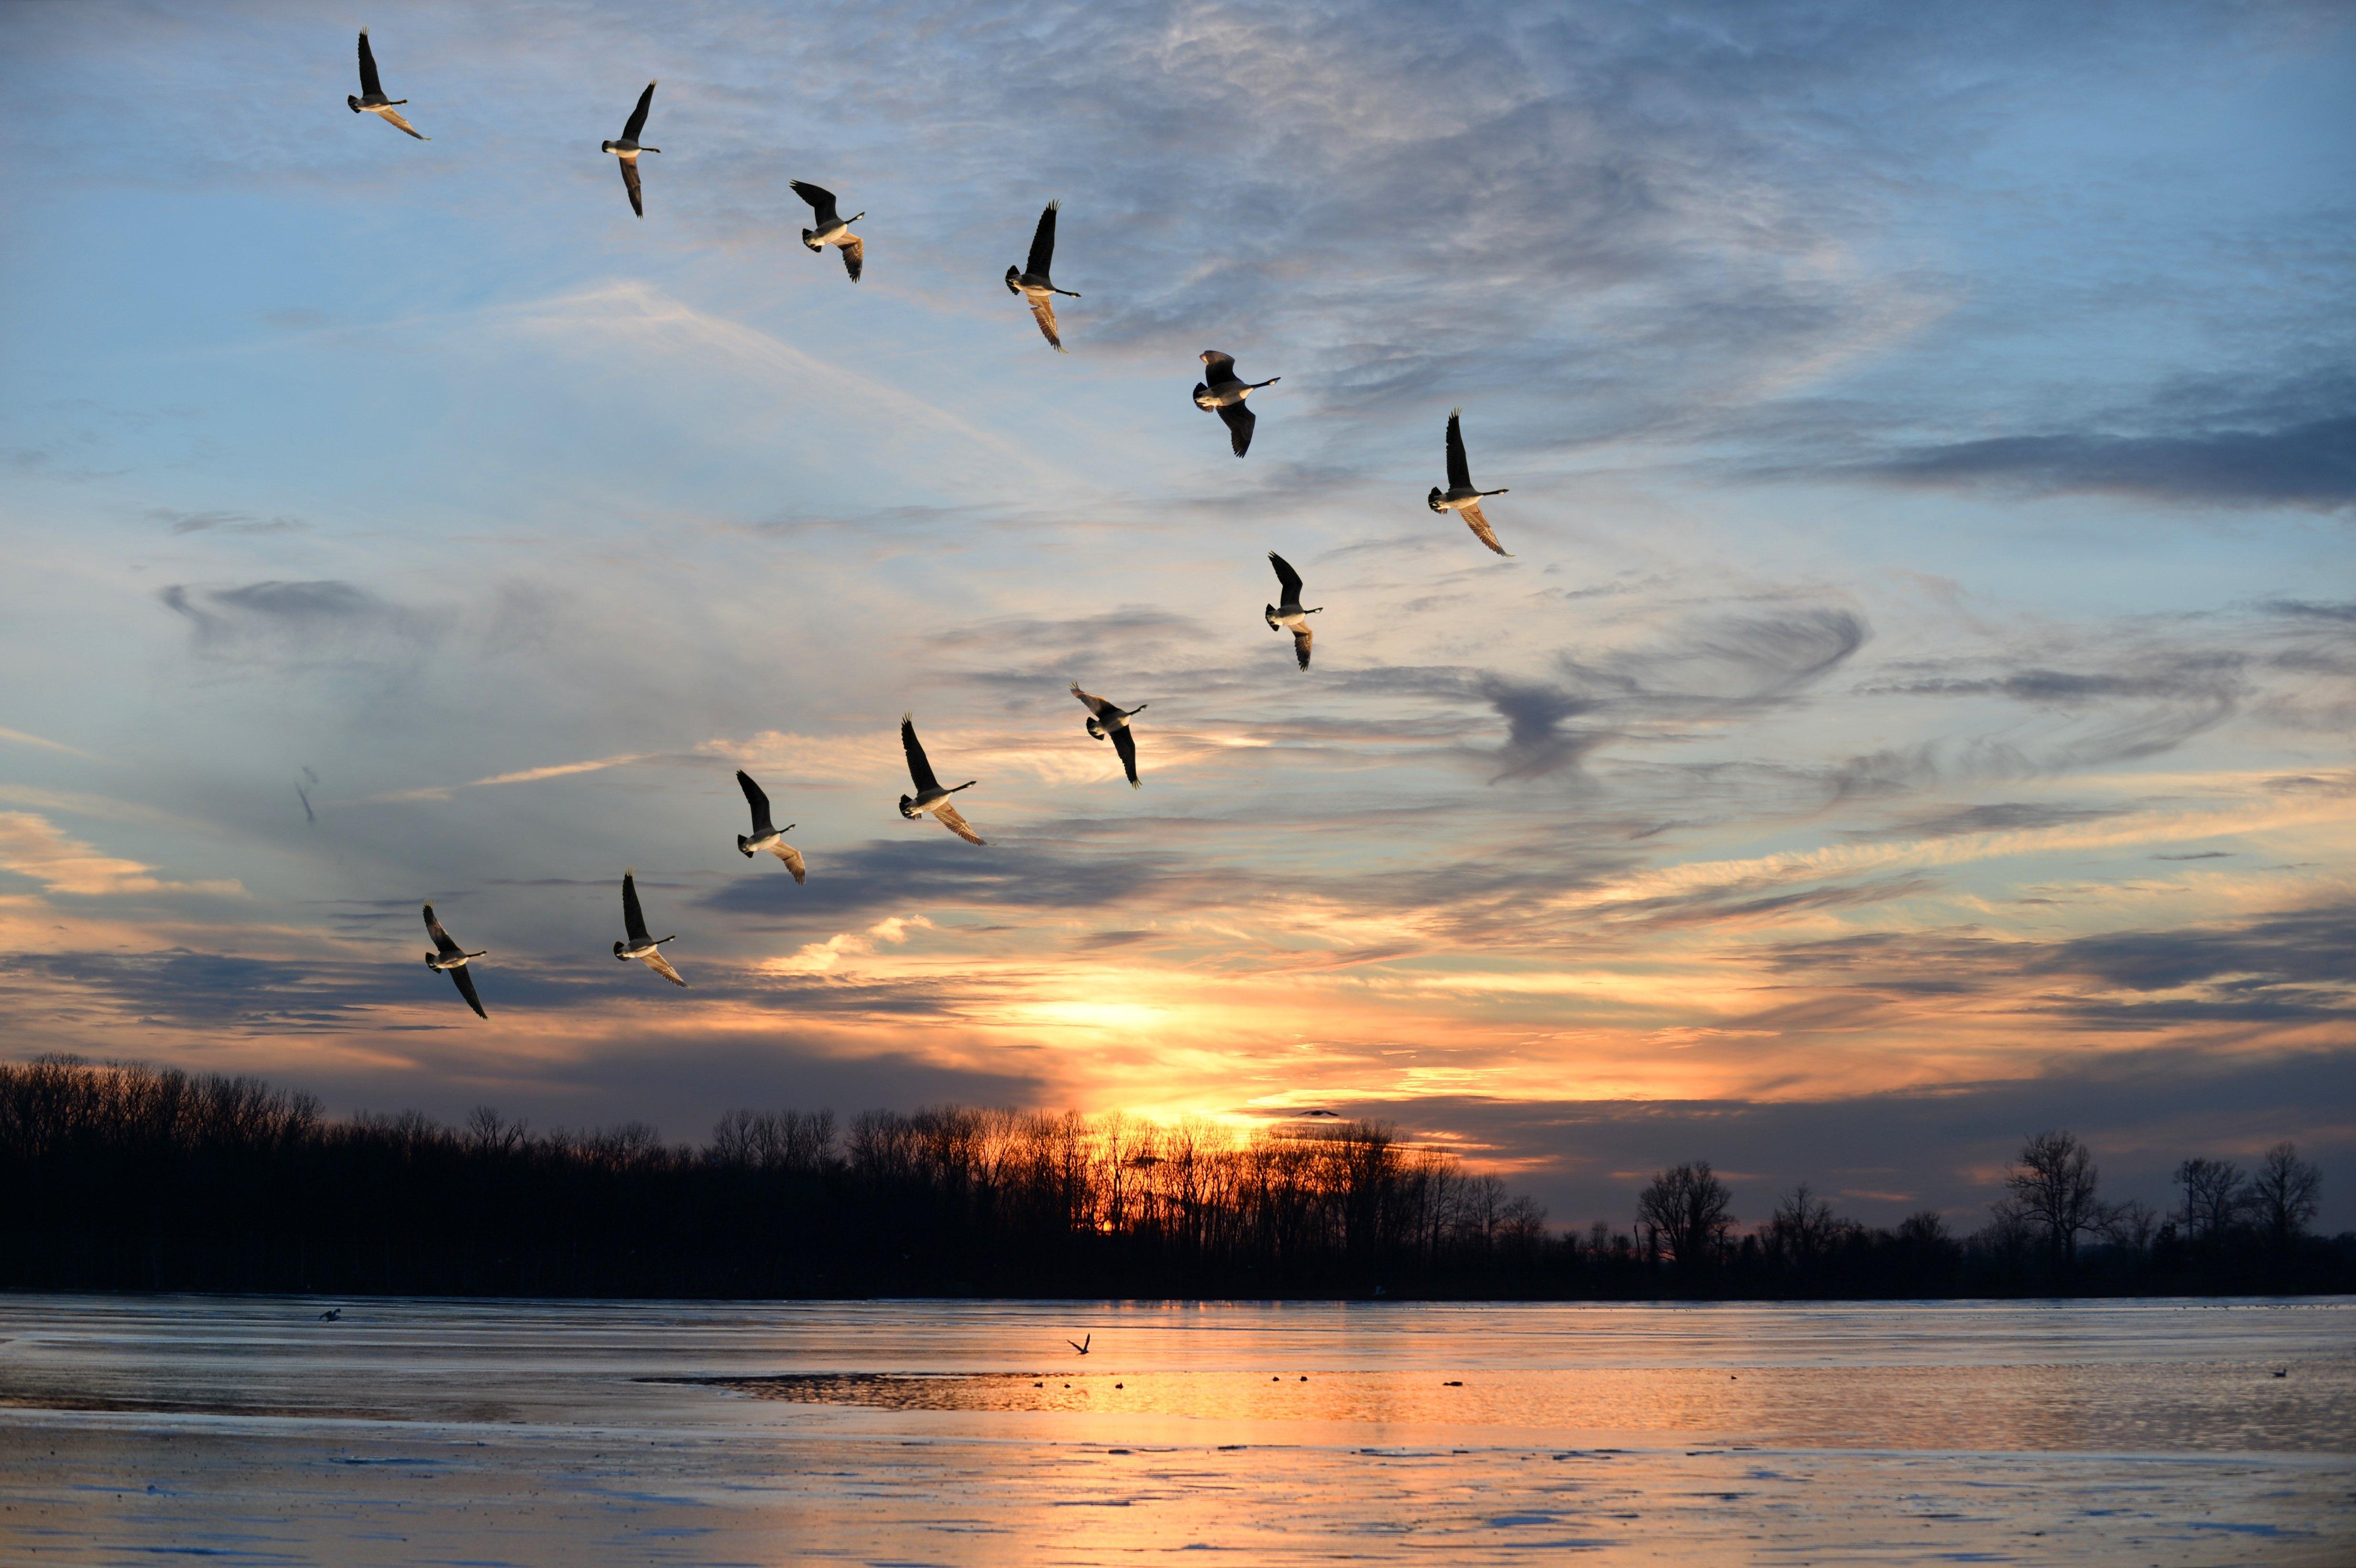 birds_AdobeStock_62110777.jpg